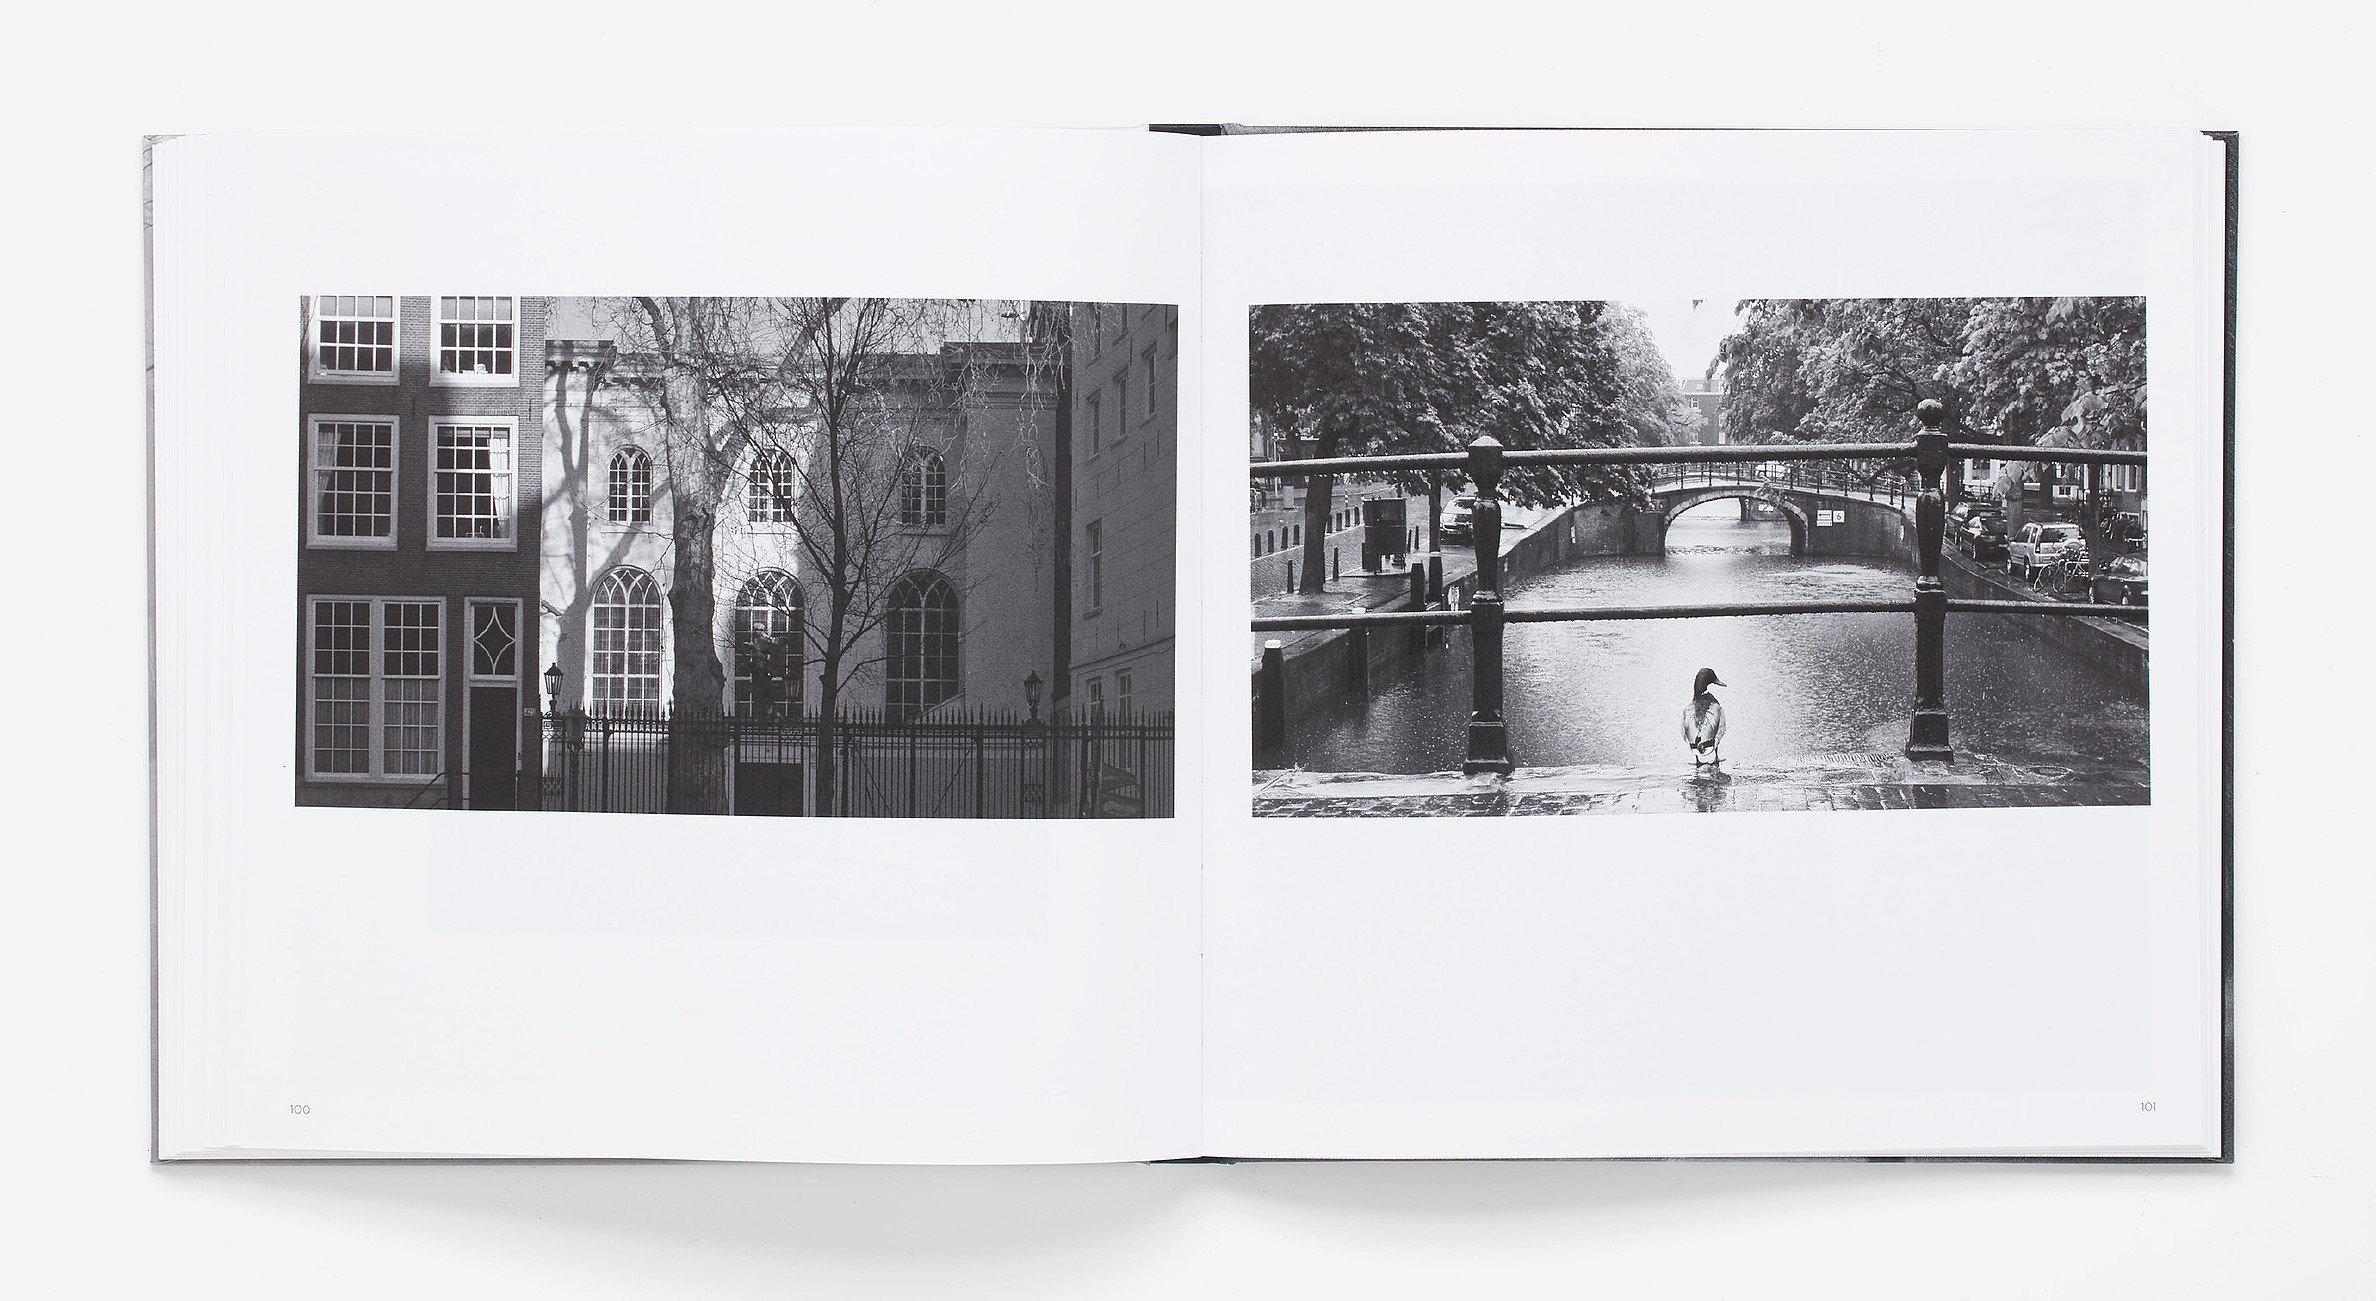 csm_Pim-Kops-Amsterdam-boek-5-Opera_75db888628.jpg